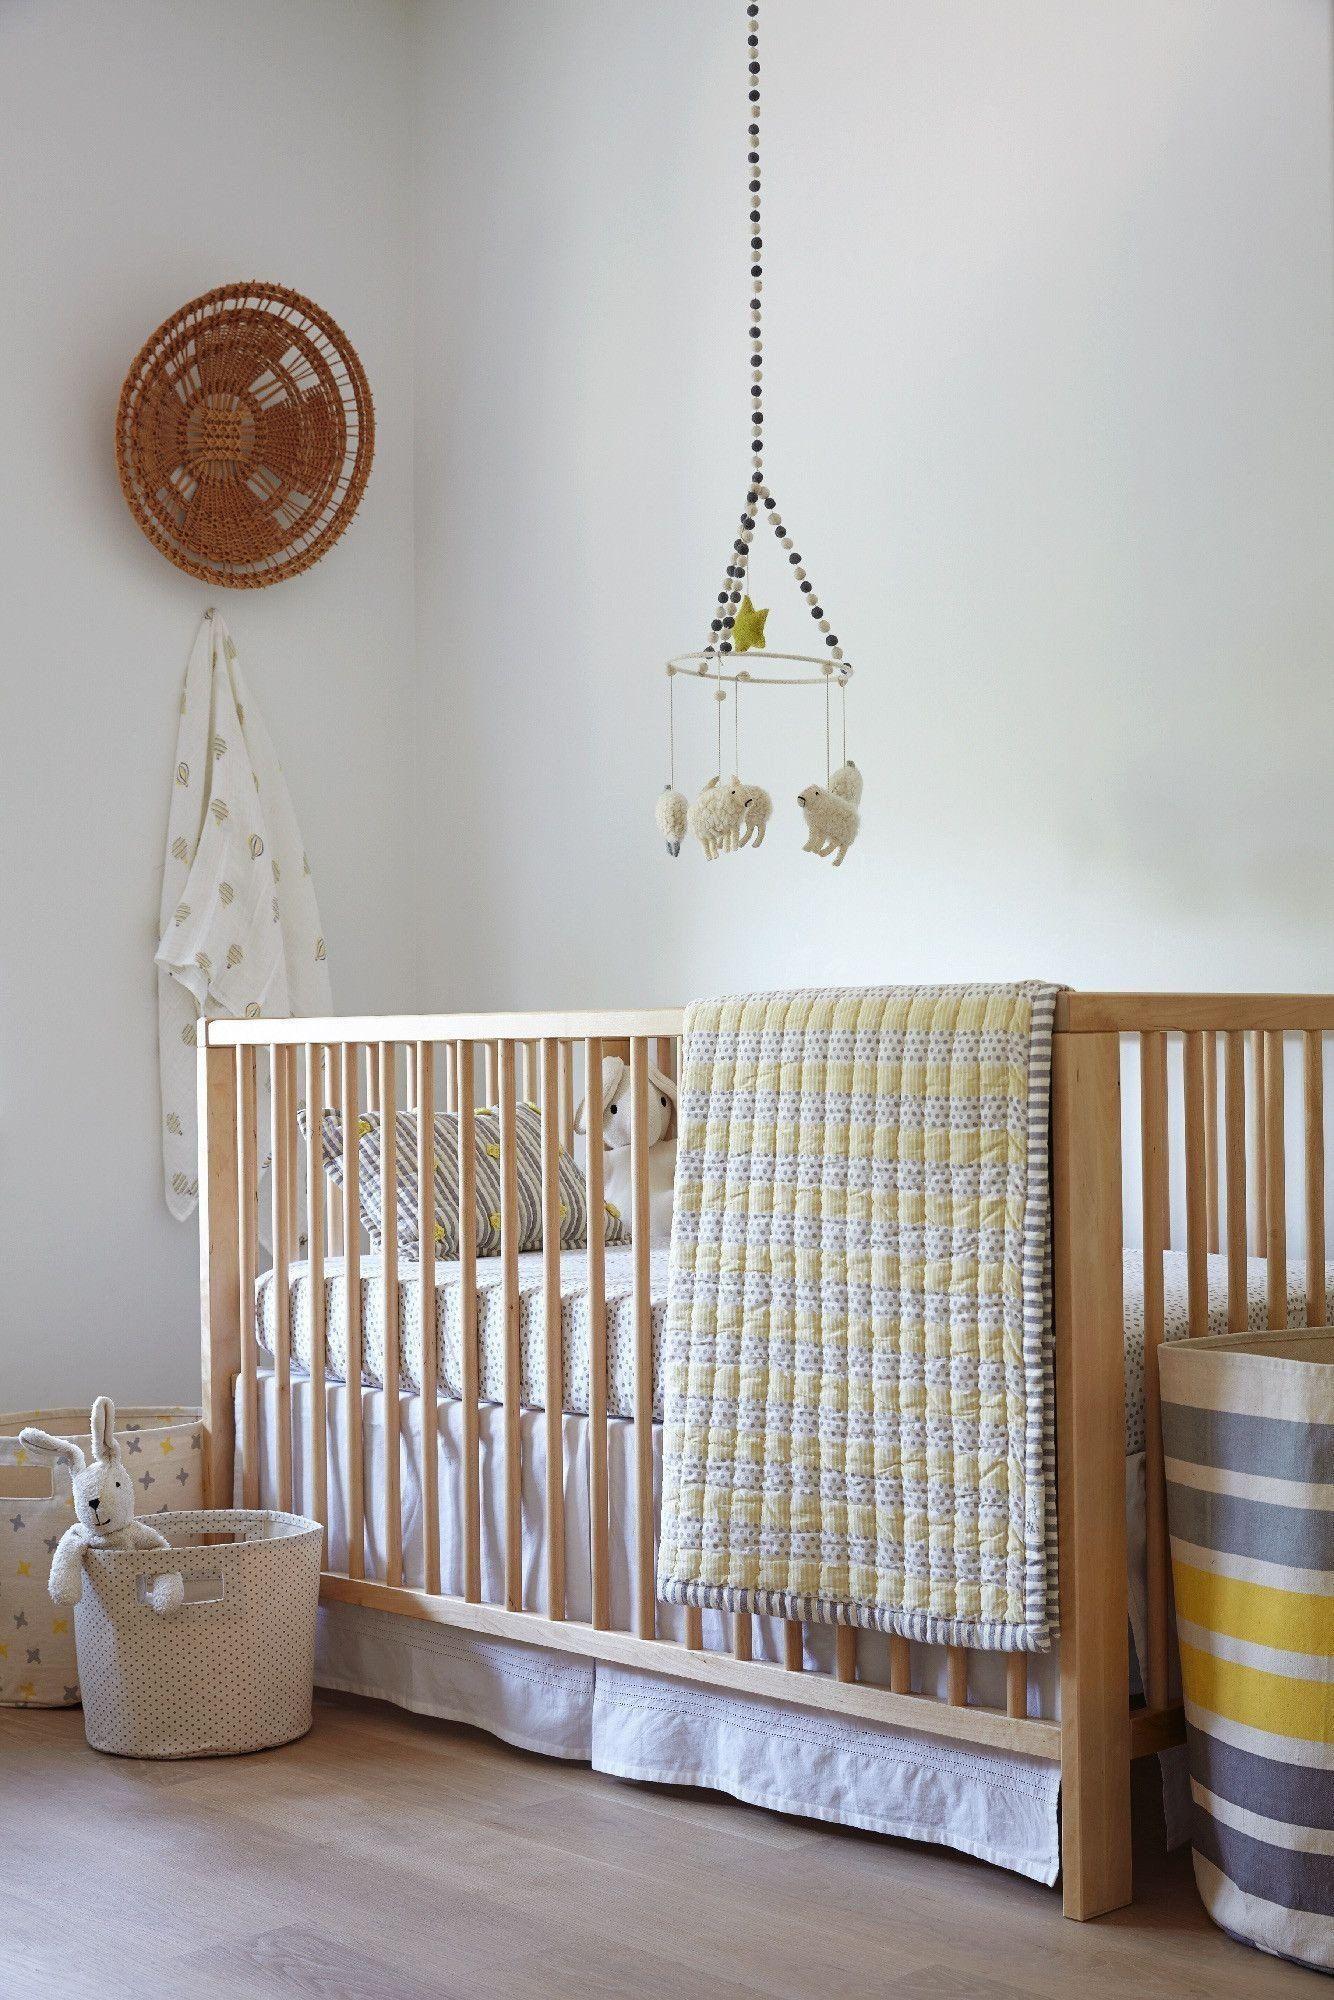 Crib Decoration Ideas Luxury Natural Wood Decor Ideas For Your Nursery You Ll Love In 2020 Crib Decoration White Crib White Crib Skirt